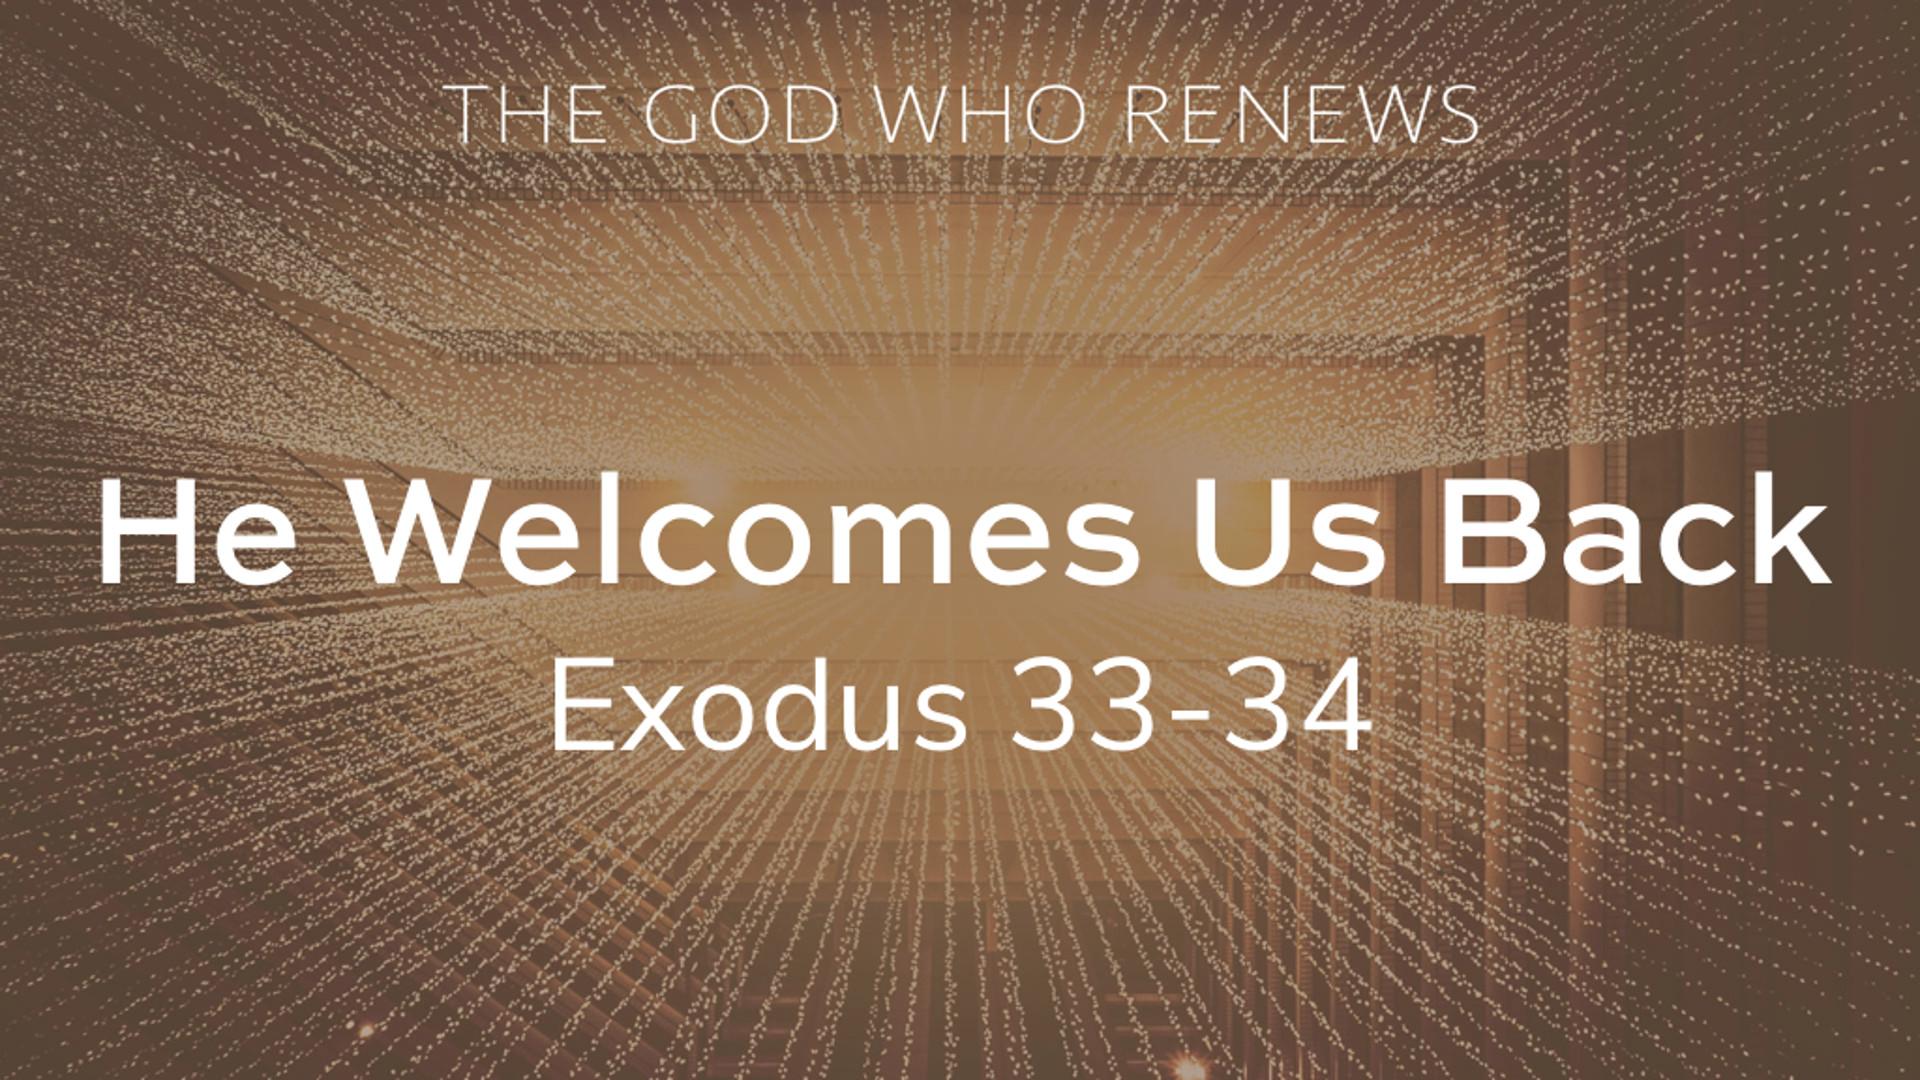 Exodus 33-34 - He Welcomes Us Back.jpg